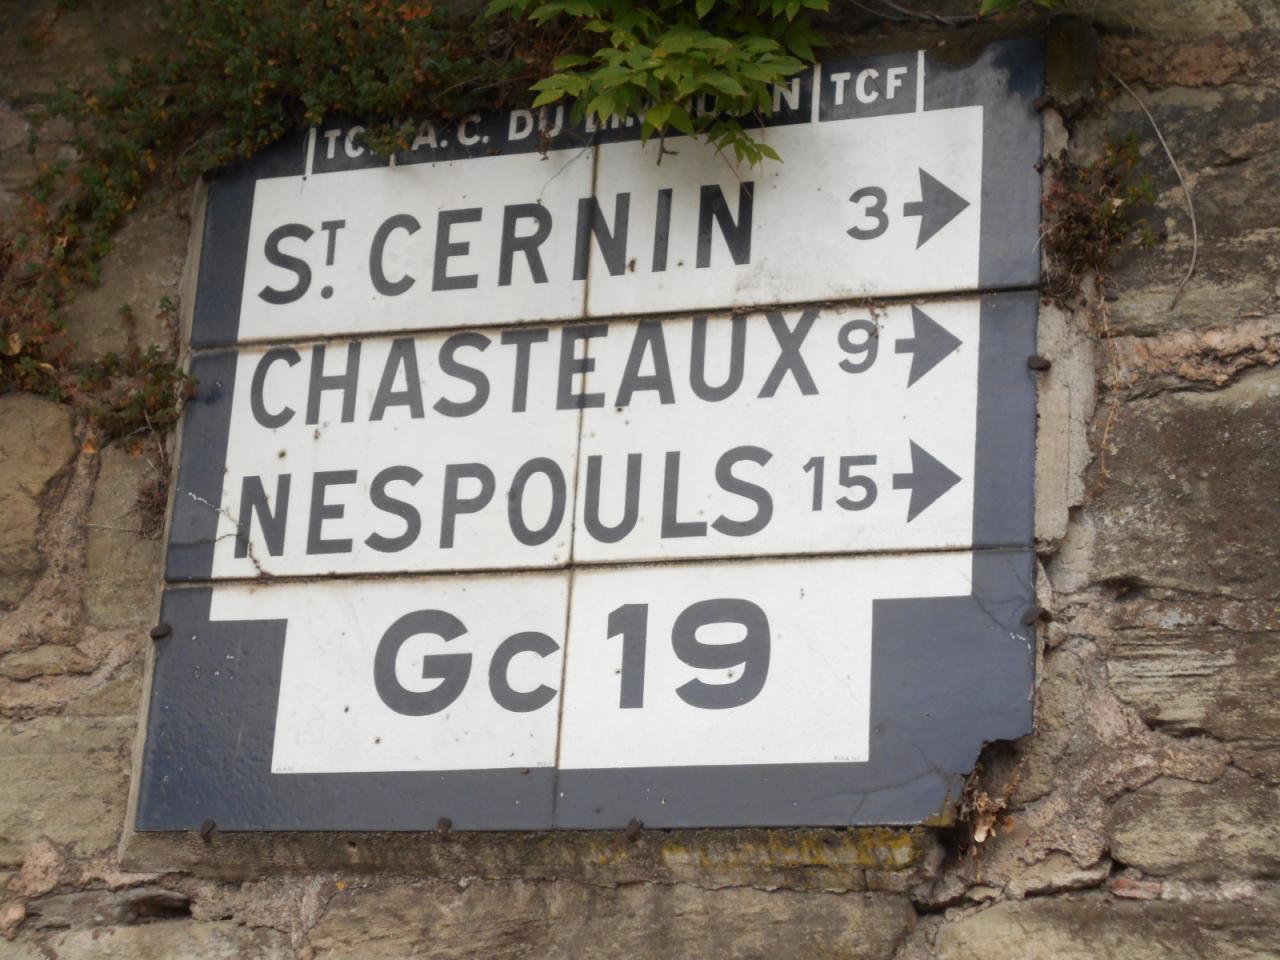 19600 Chasteaux